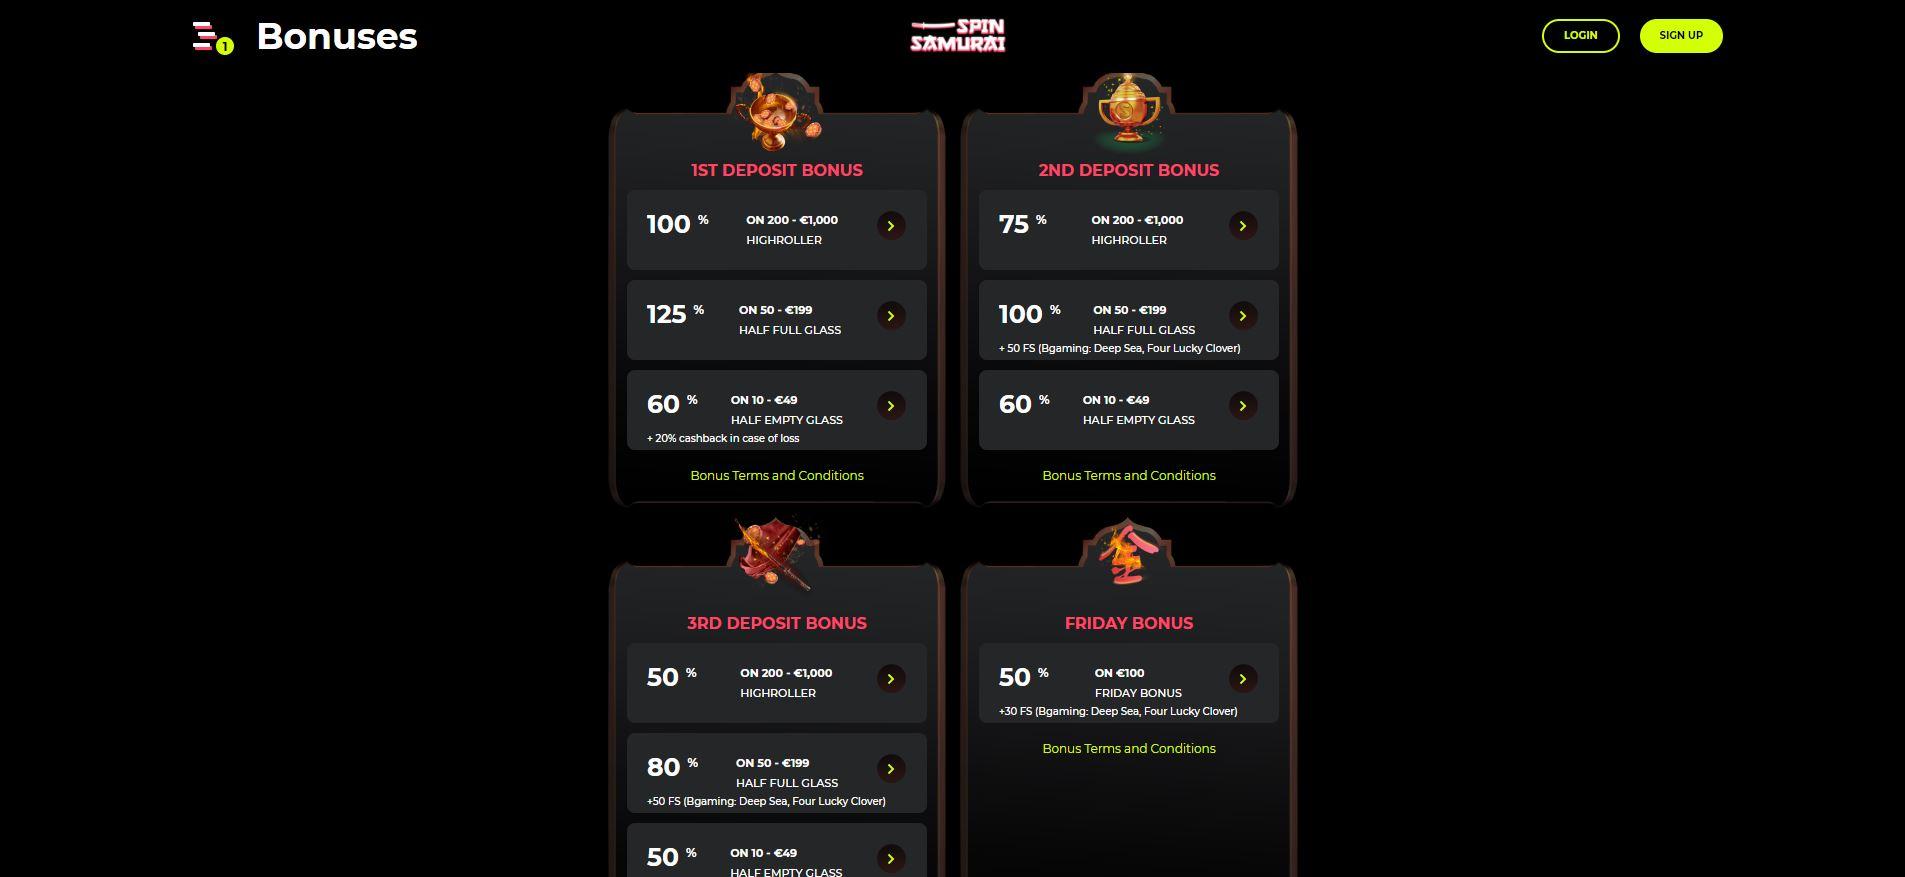 Spin Samurai Casino Promotions Screenshot